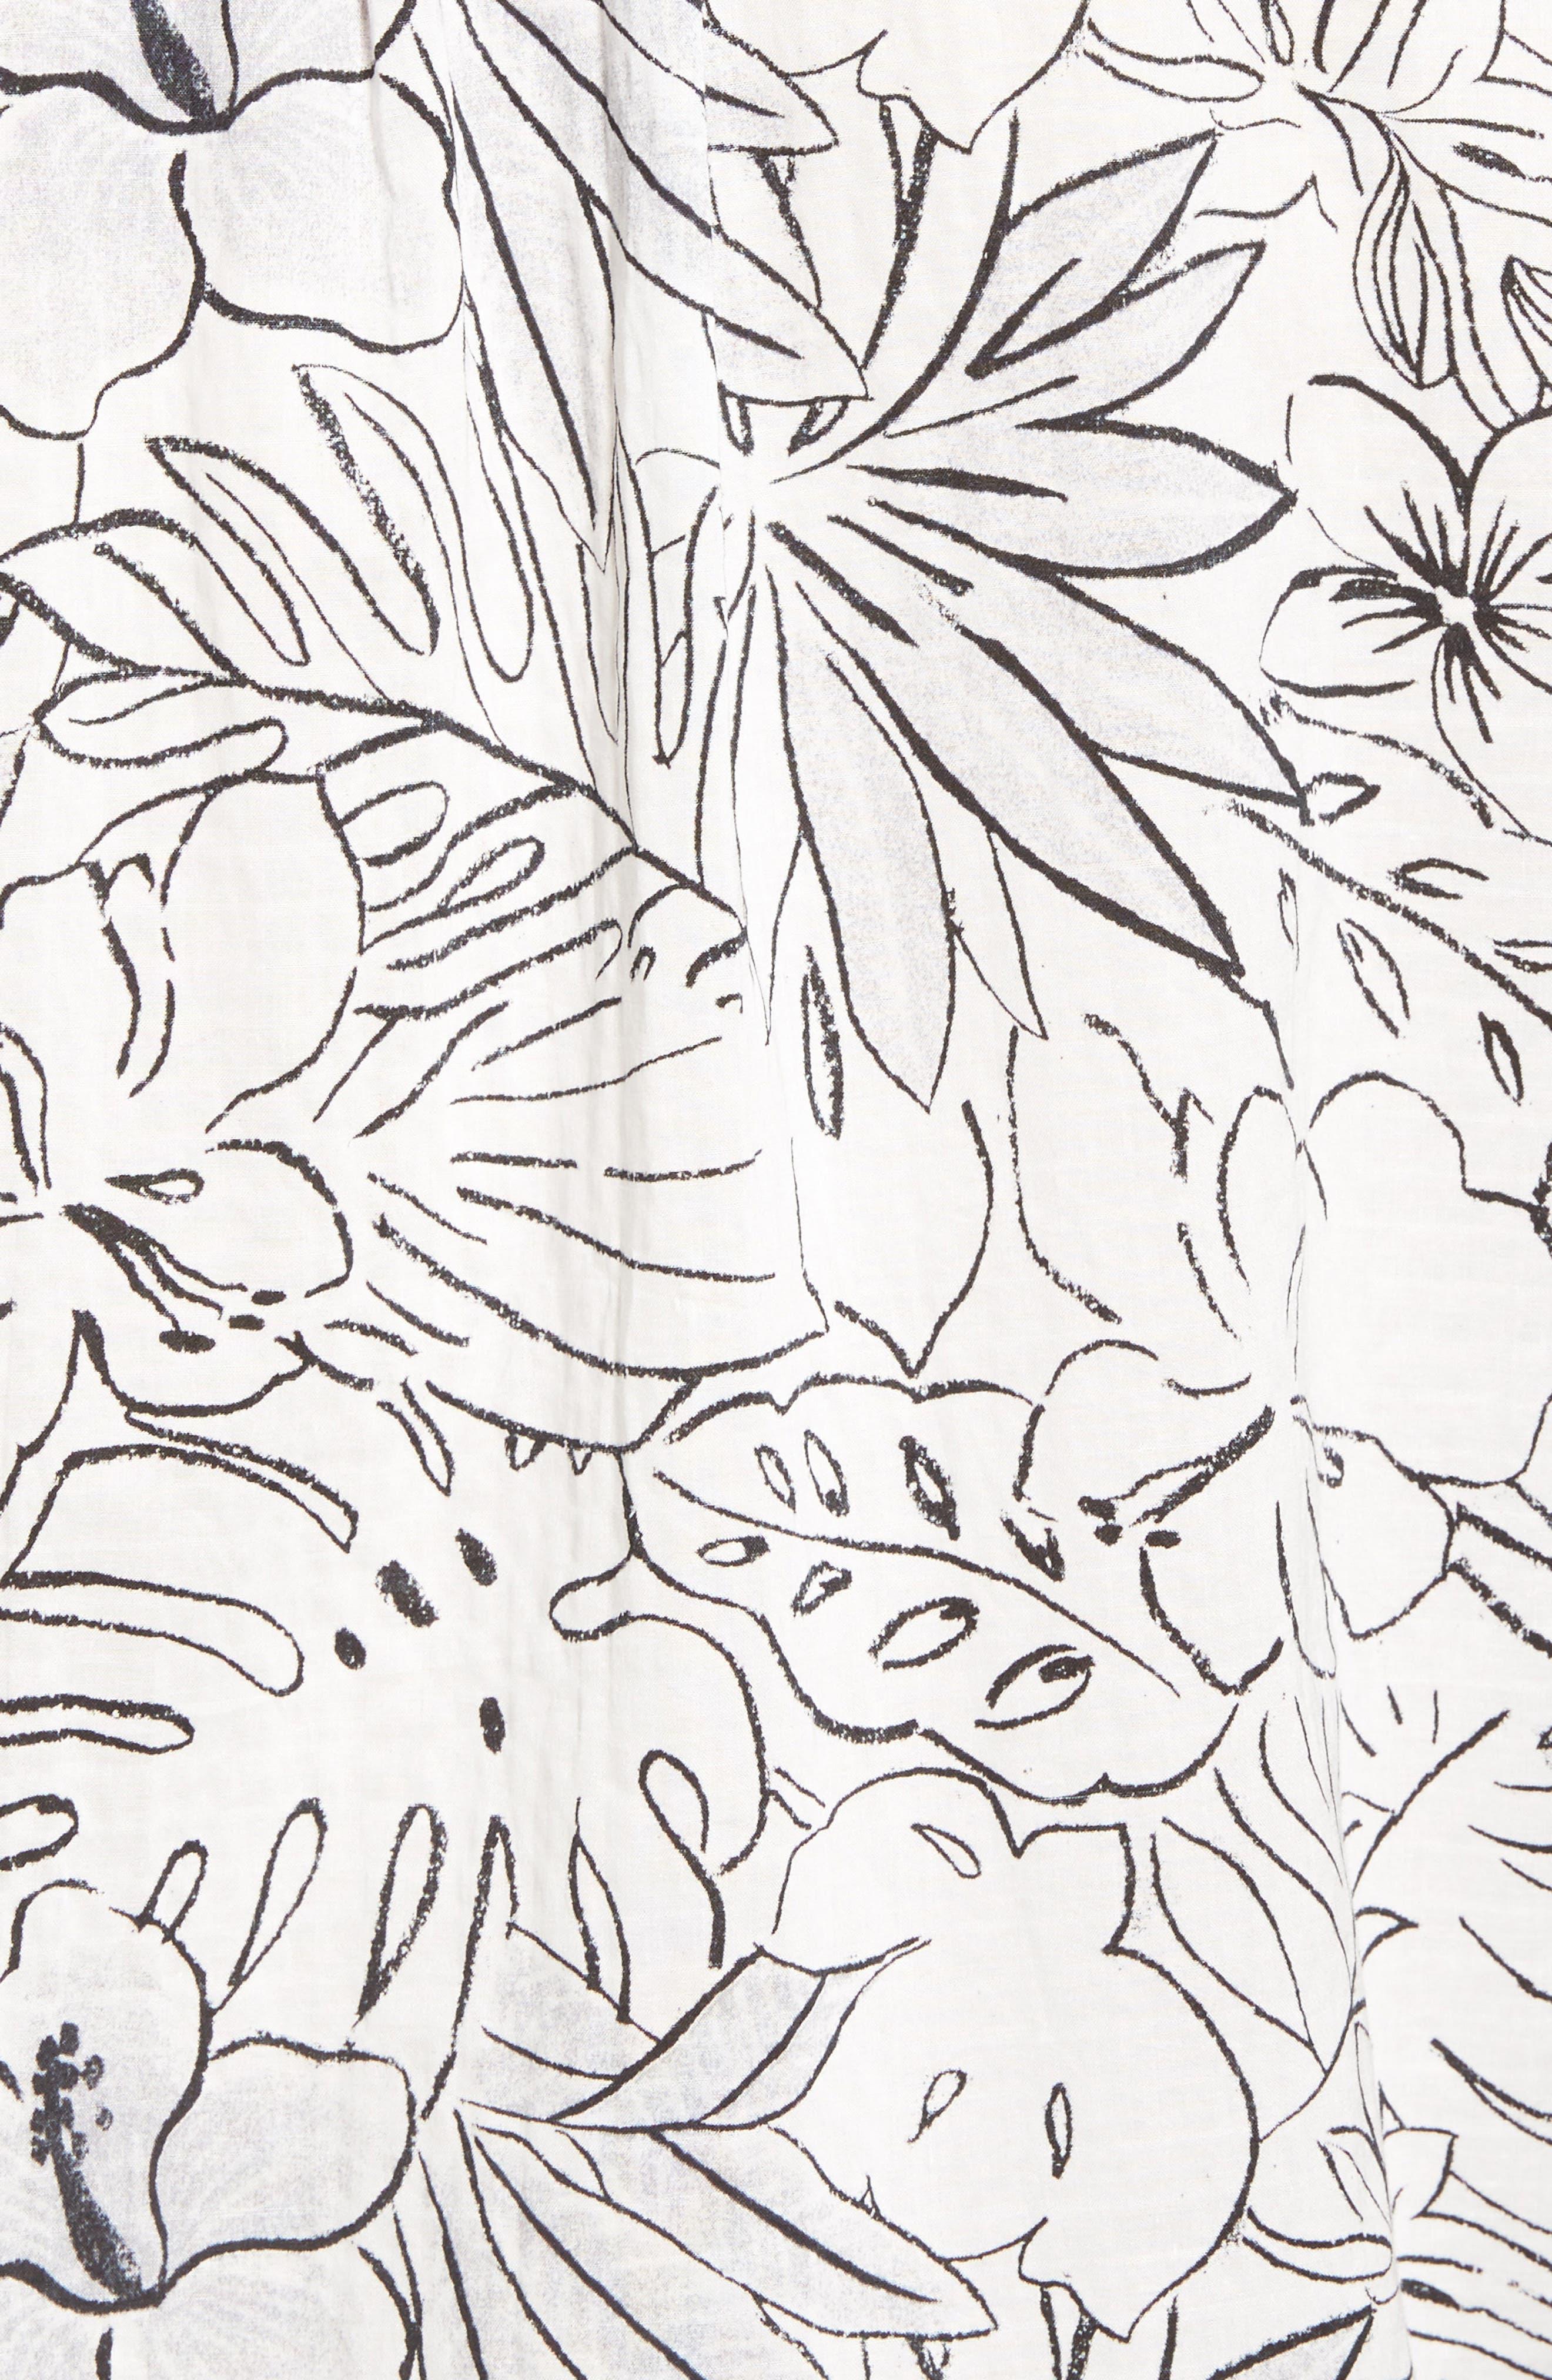 Sarasota Sketch Print Camp Shirt,                             Alternate thumbnail 5, color,                             White